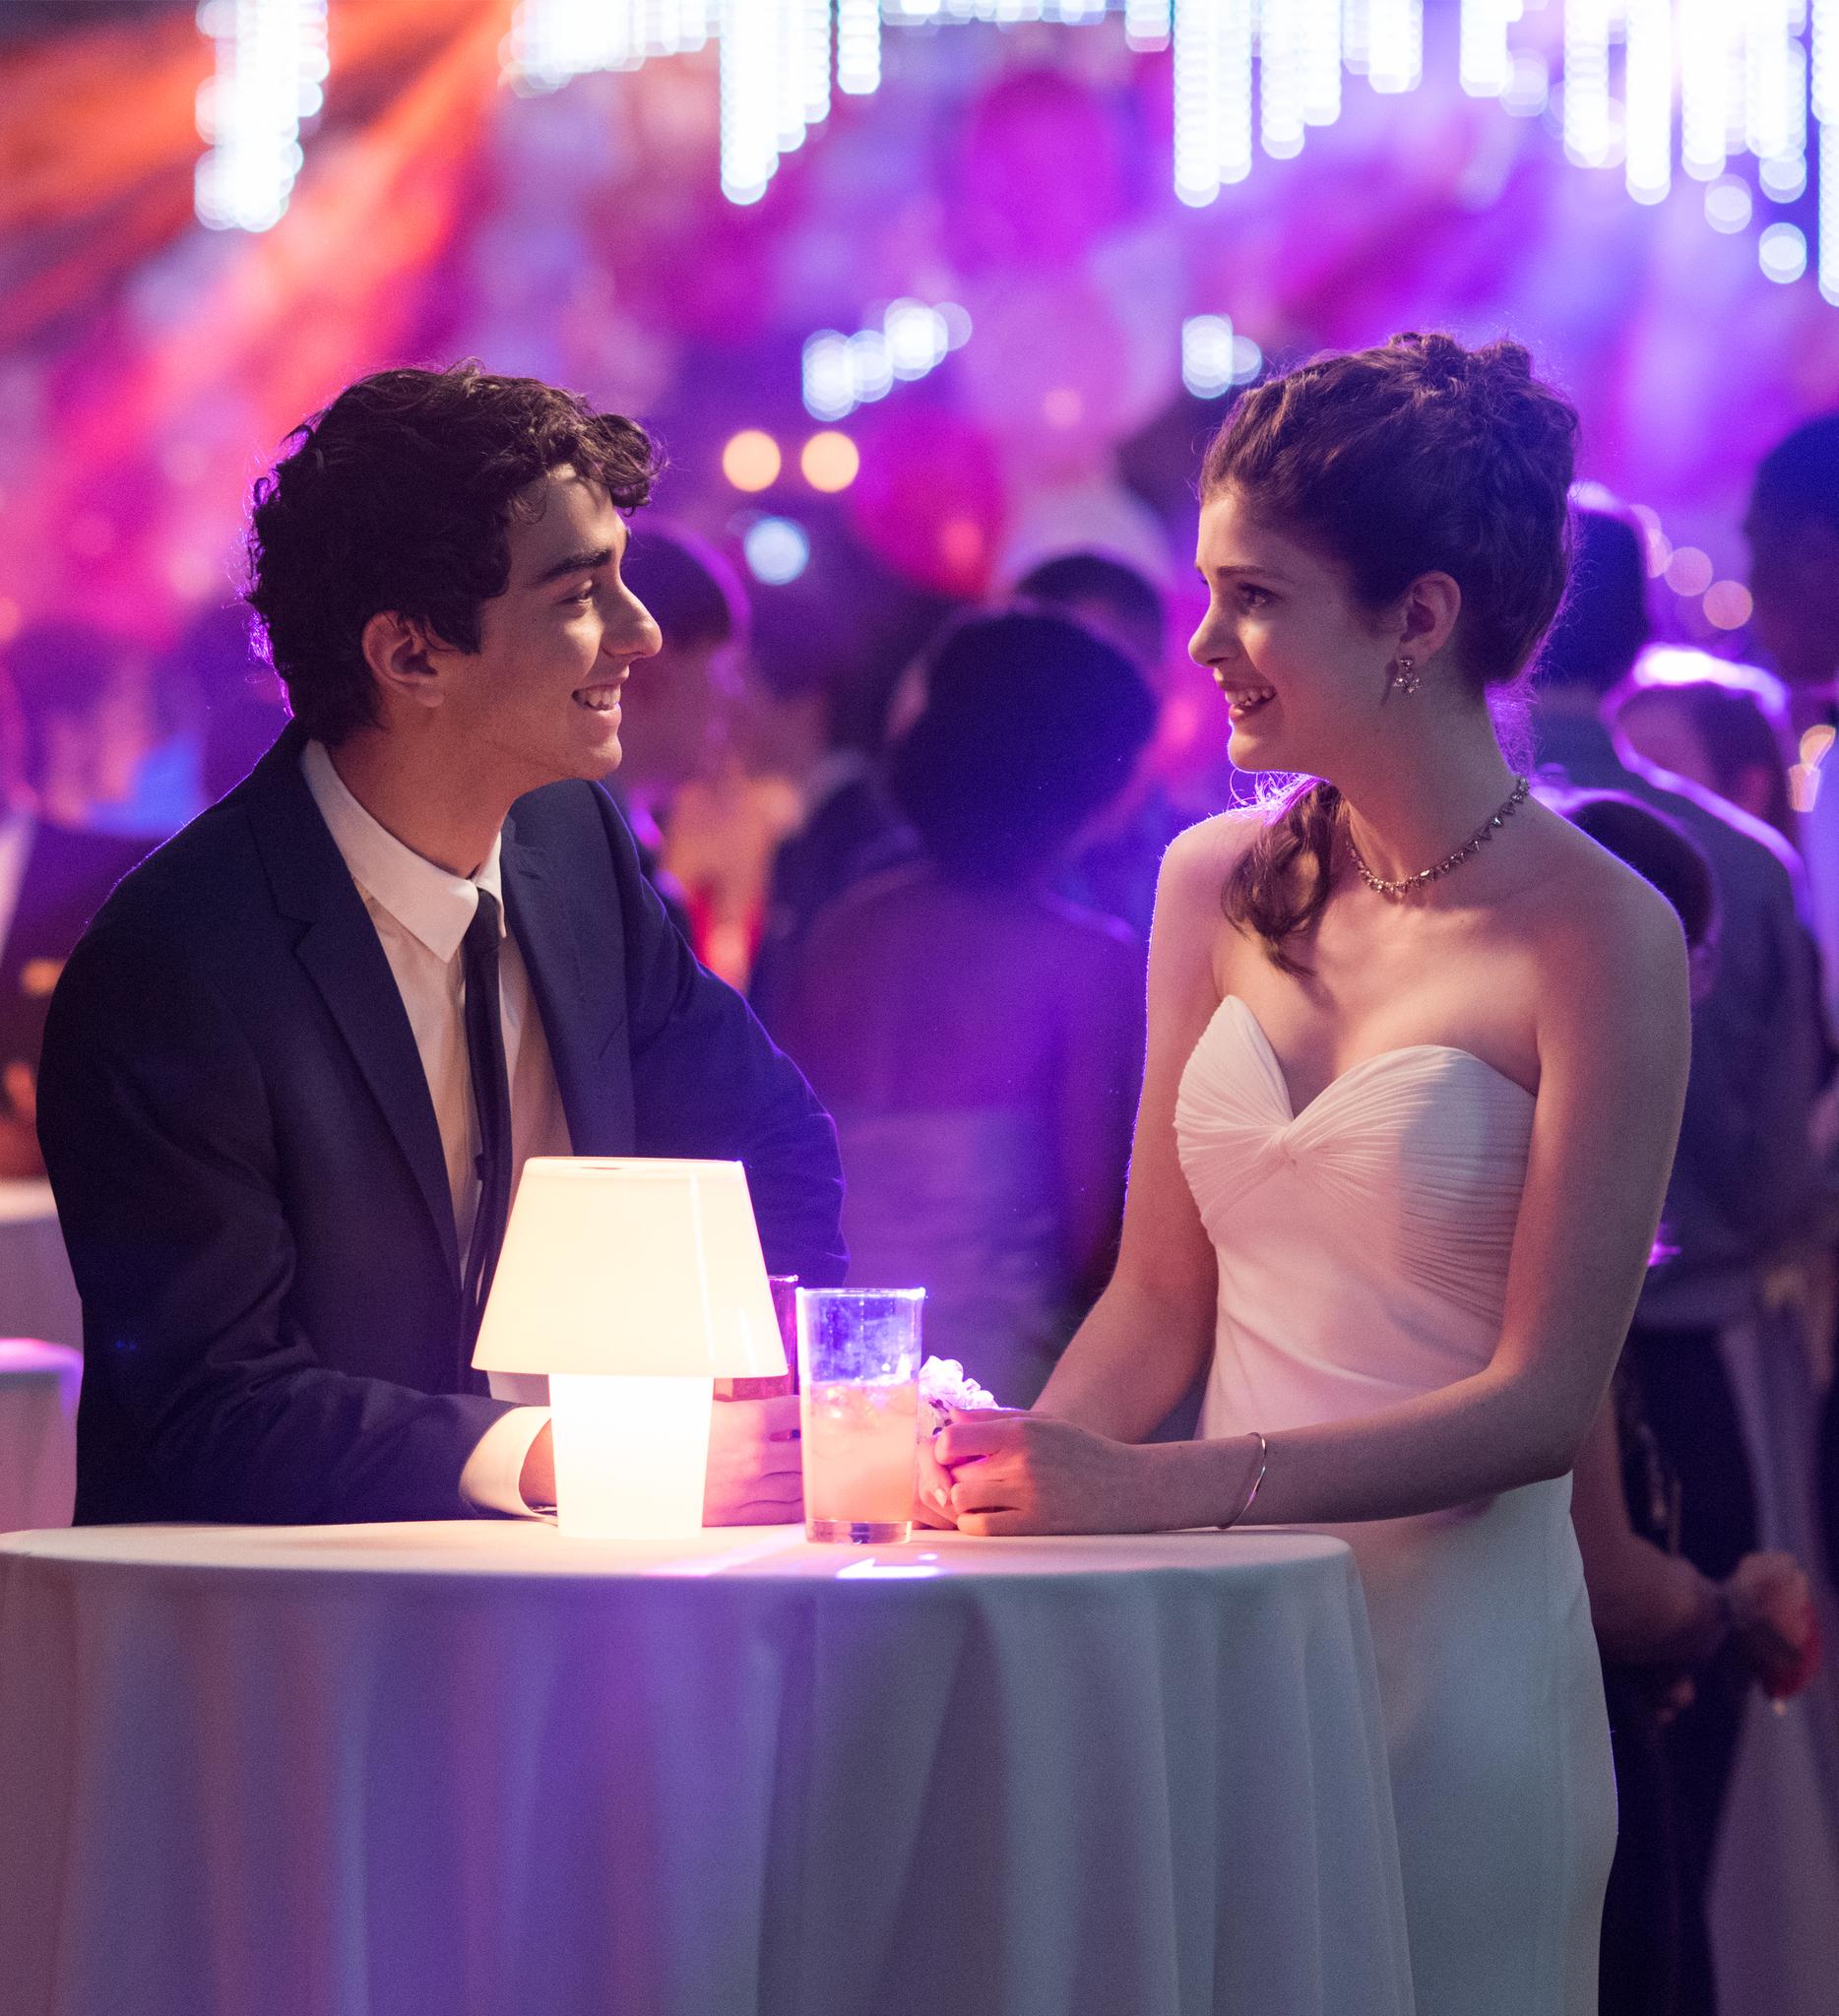 Alex Wolff and Elena Kampouris in My Big Fat Greek Wedding 2 (2016)